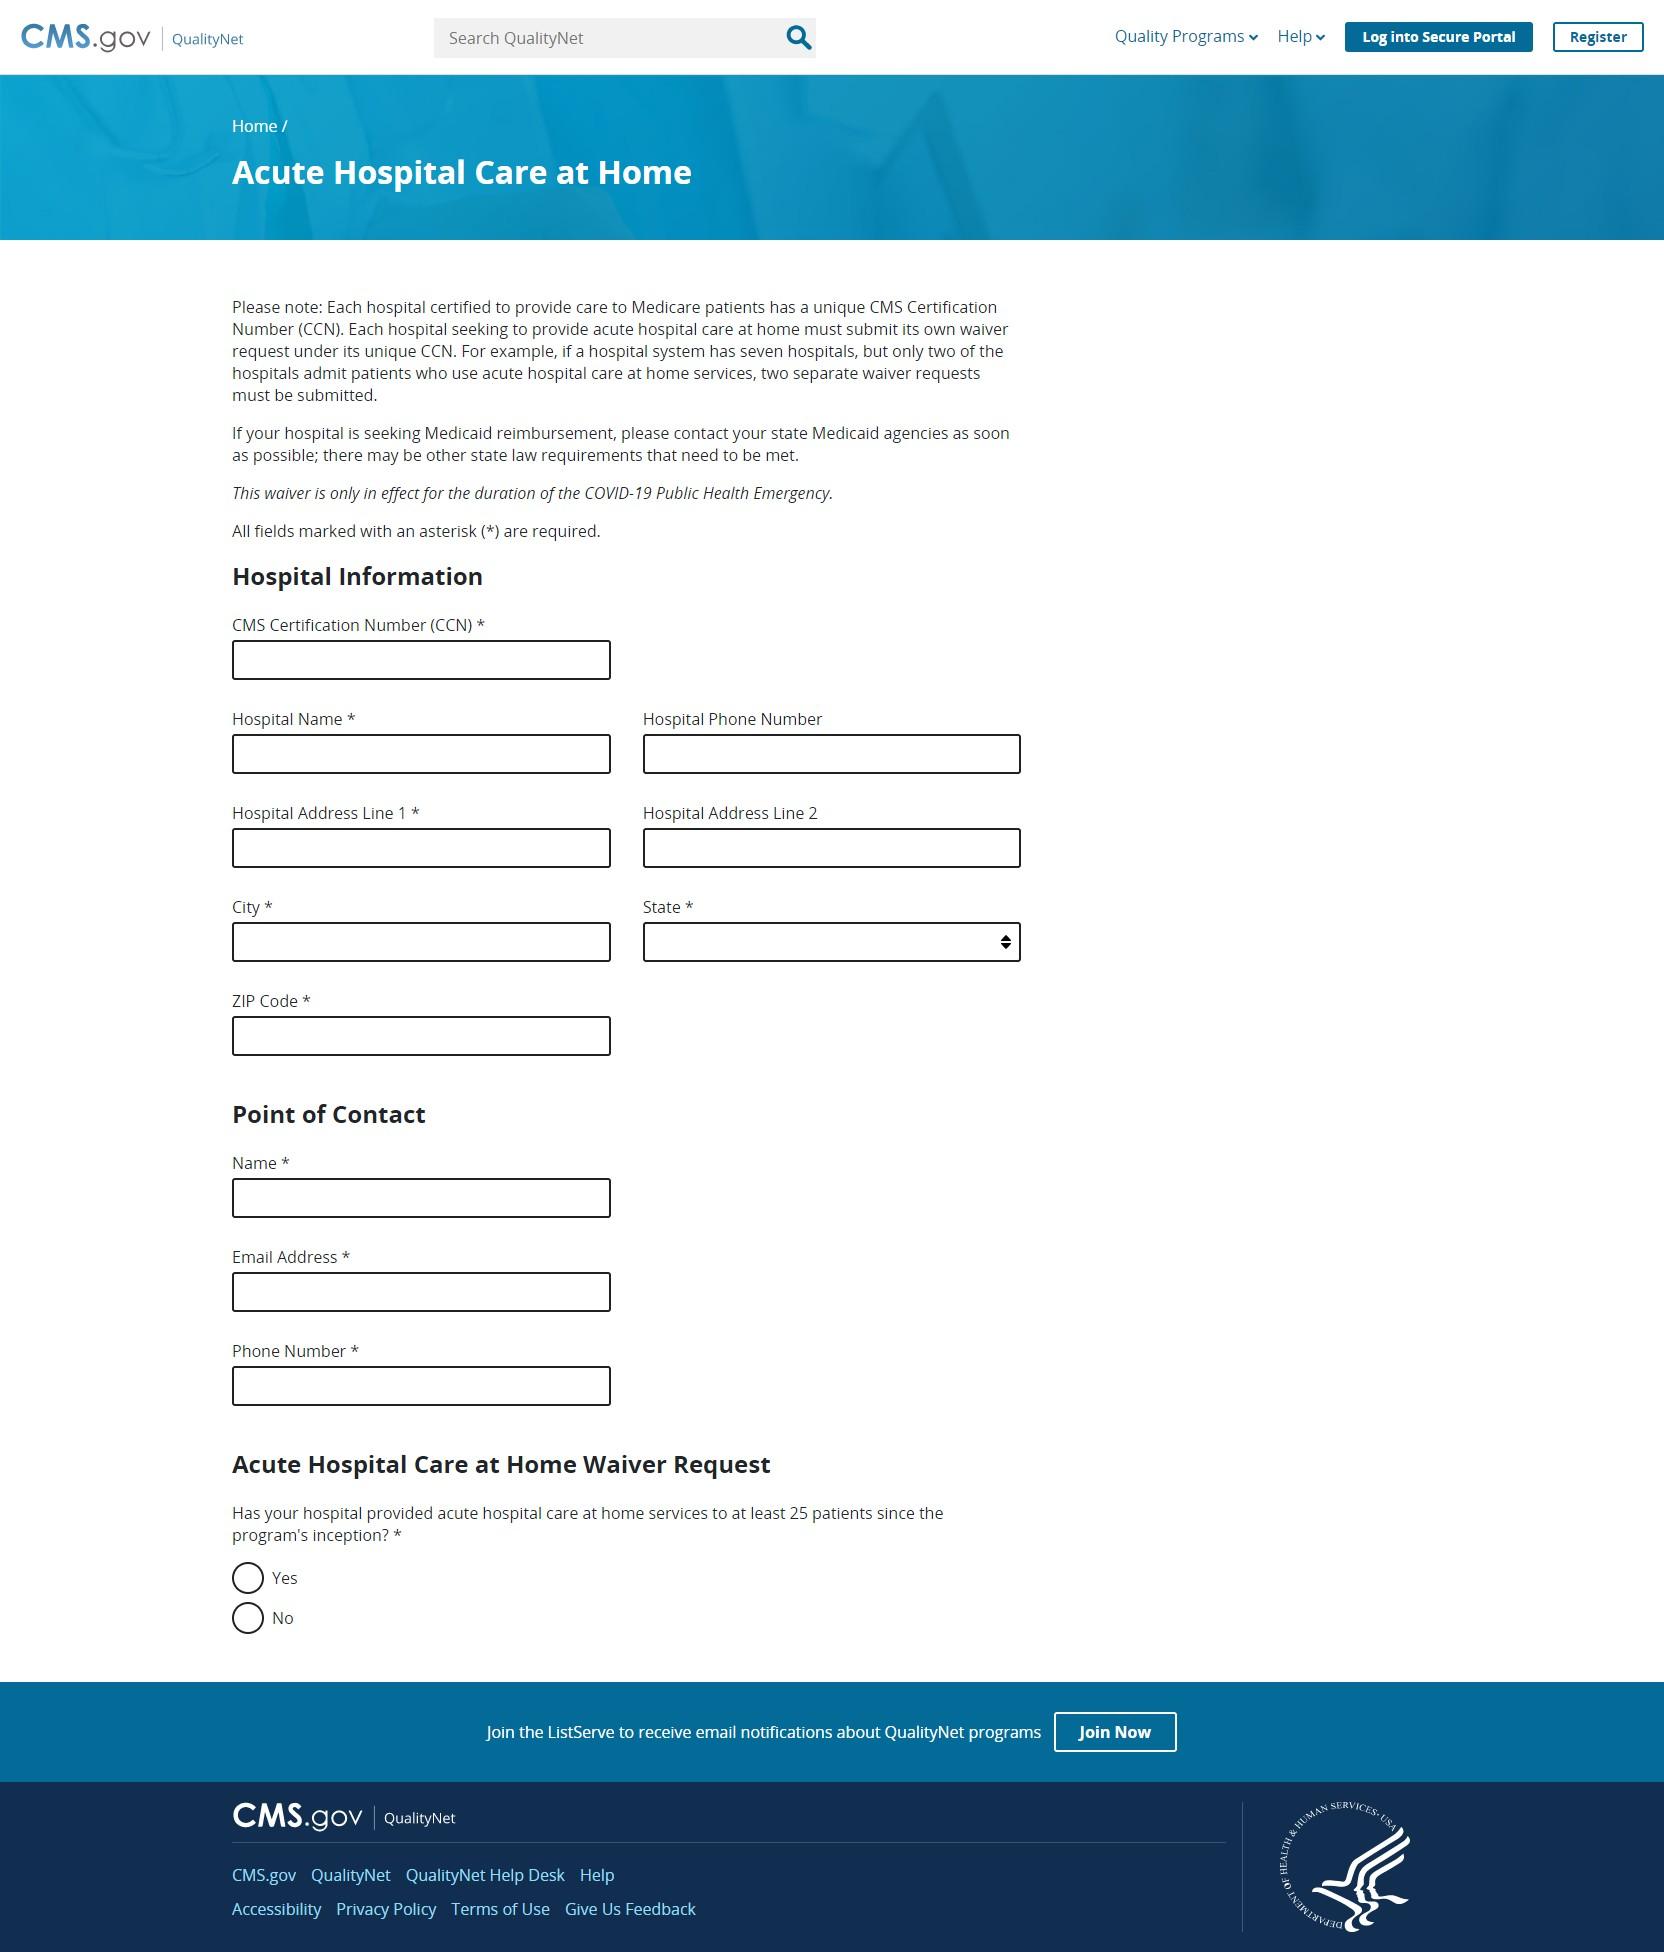 AHCAH waiver request form